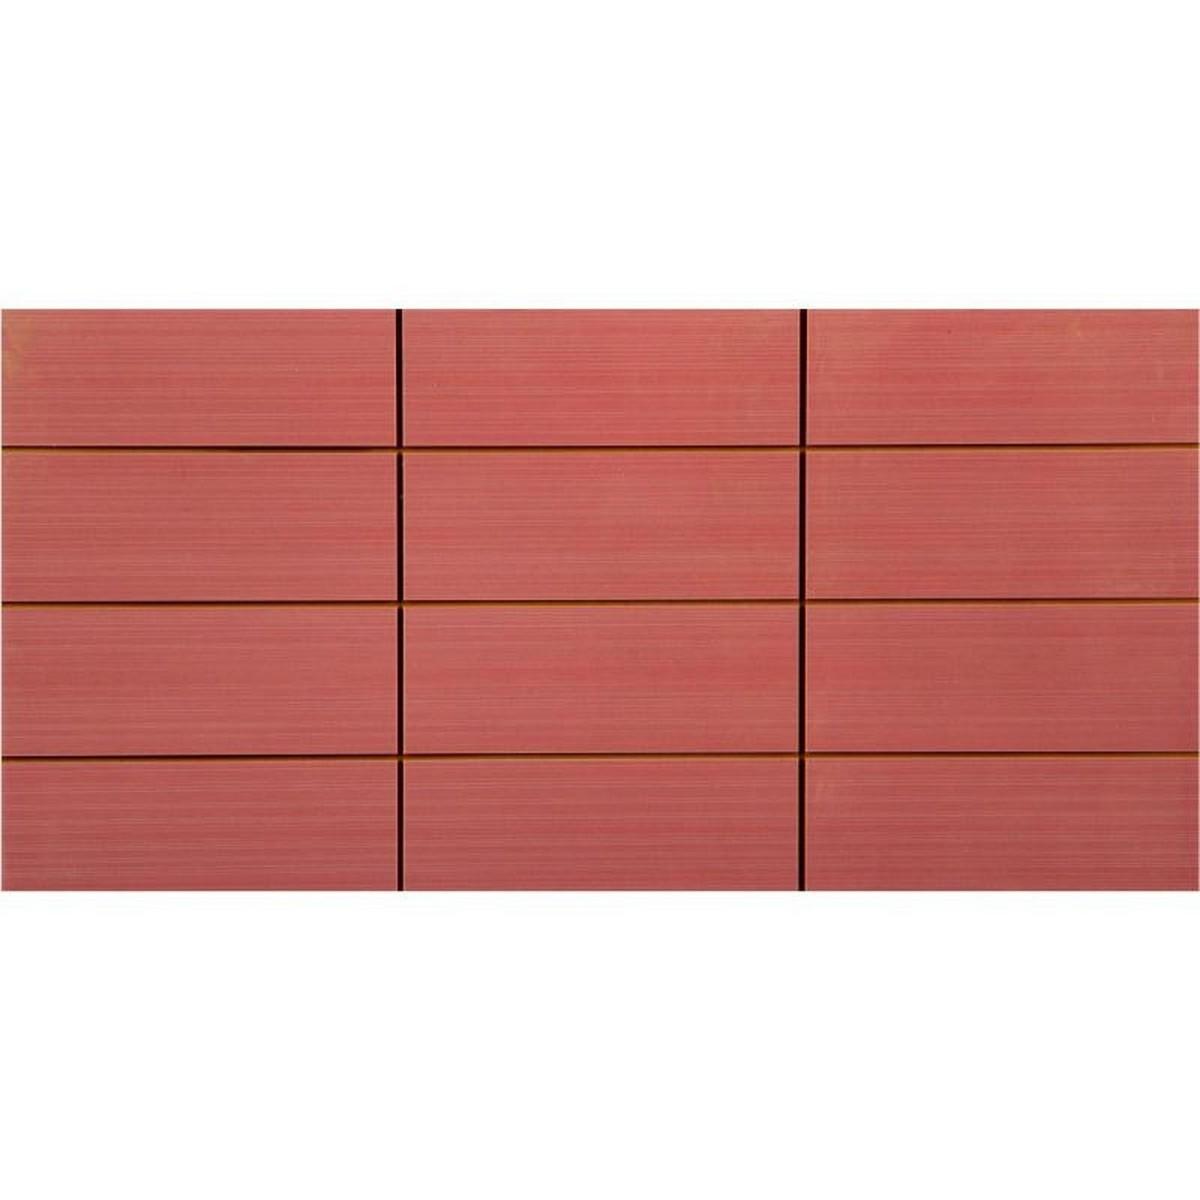 Вставка Фрэска 12 20х40 см цвет розовый